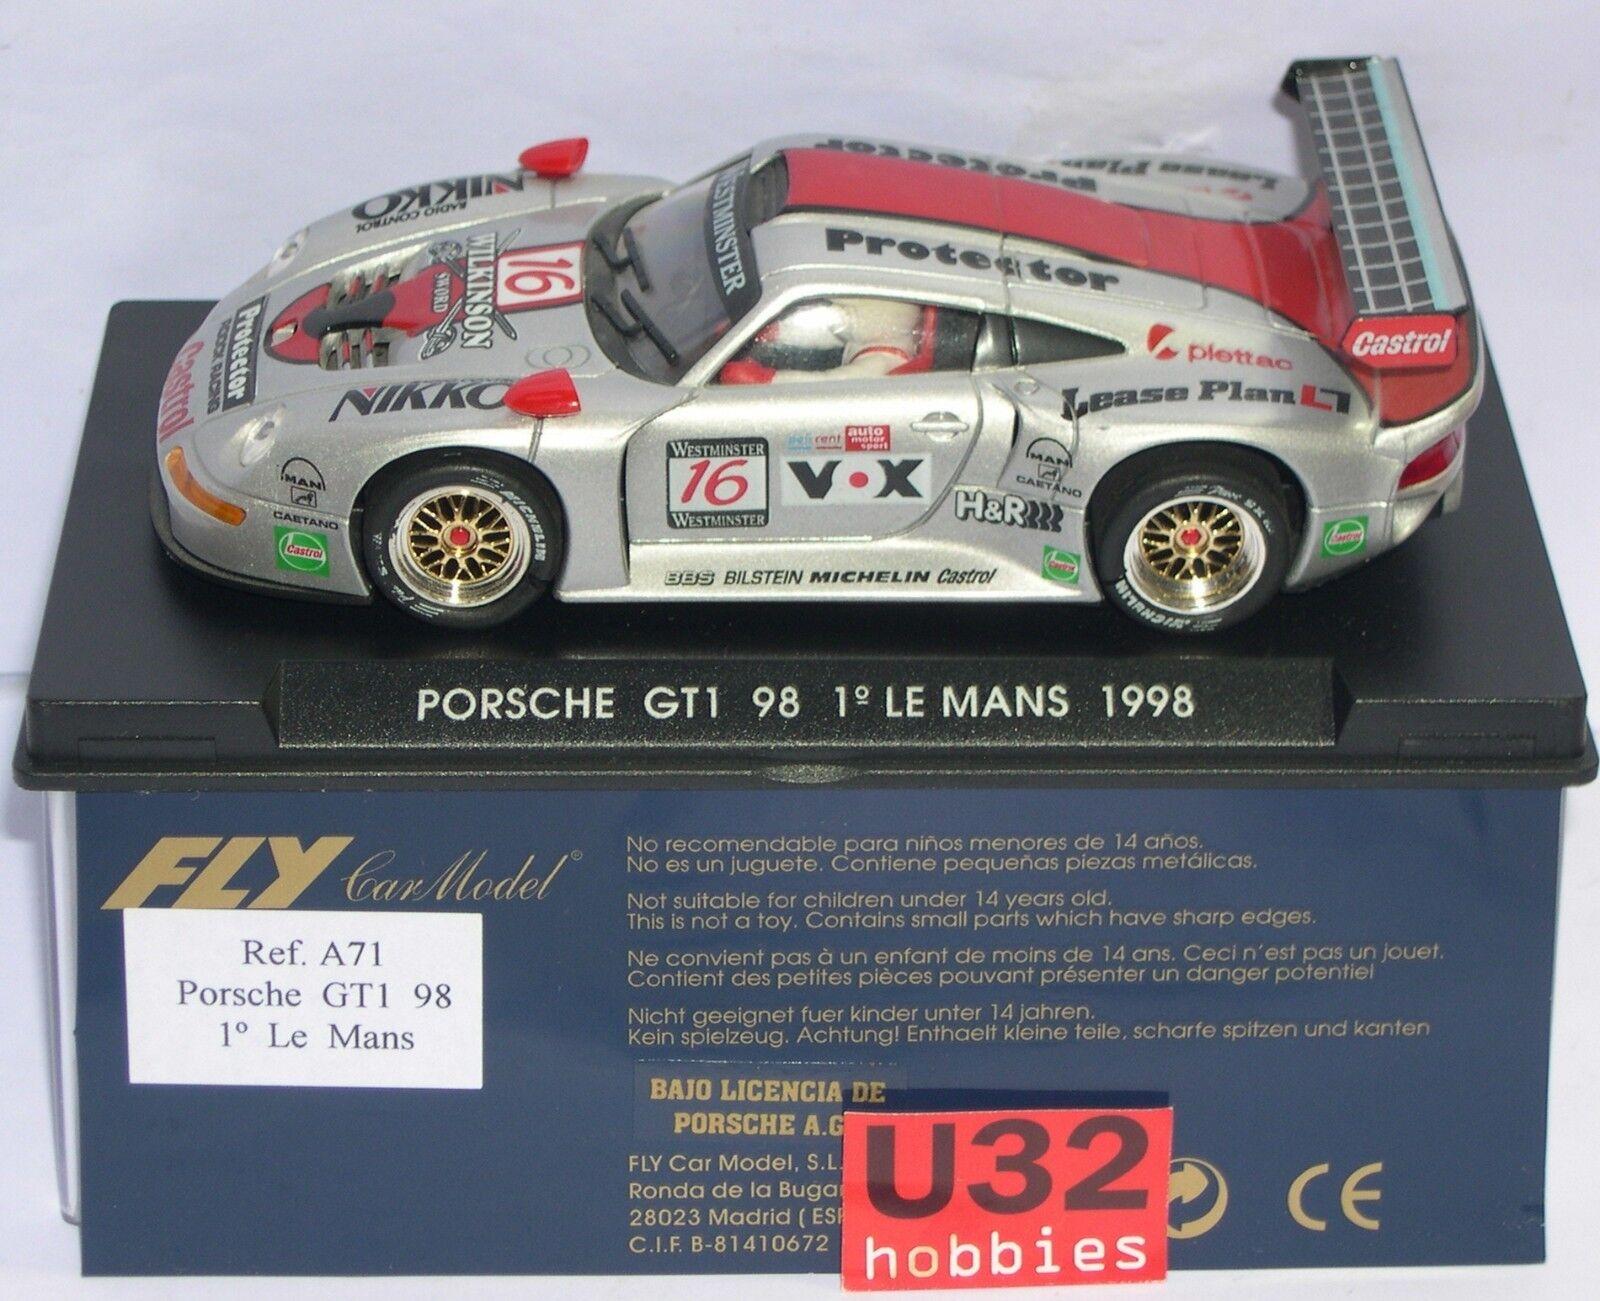 FLY A71 PORSCHE 911 GT1 98  16 1º LE MANS 1998 WILKINSON